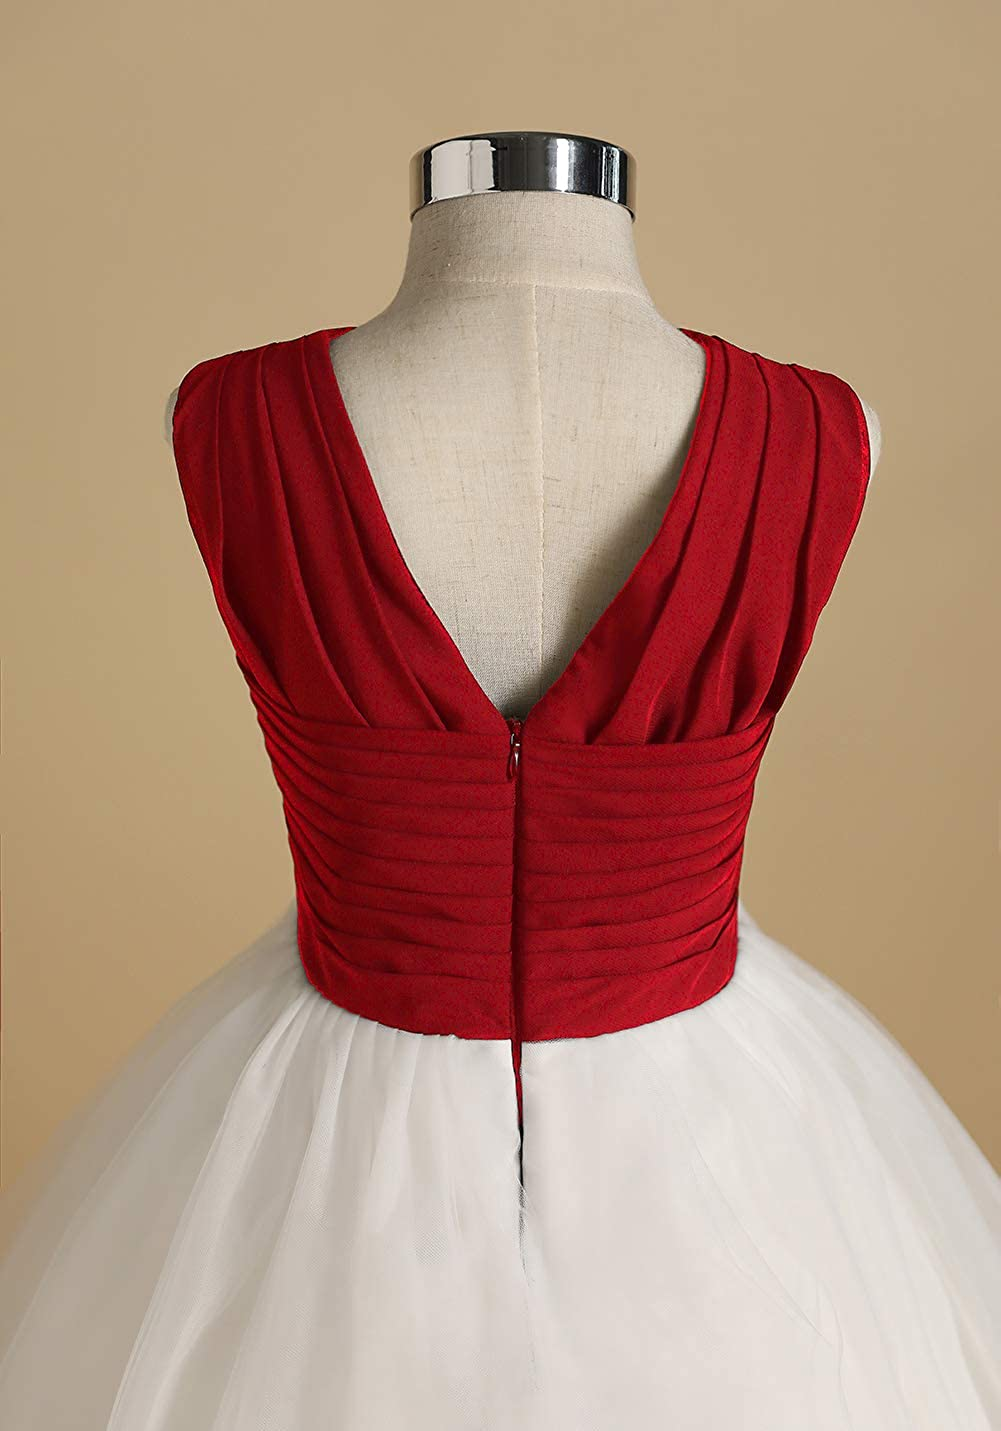 Chiffon Wedding Party Pageant Dresses for Girls Gdoker Tulle Flower Girl Dress Long Junior Bridesmaid Dress A-Line